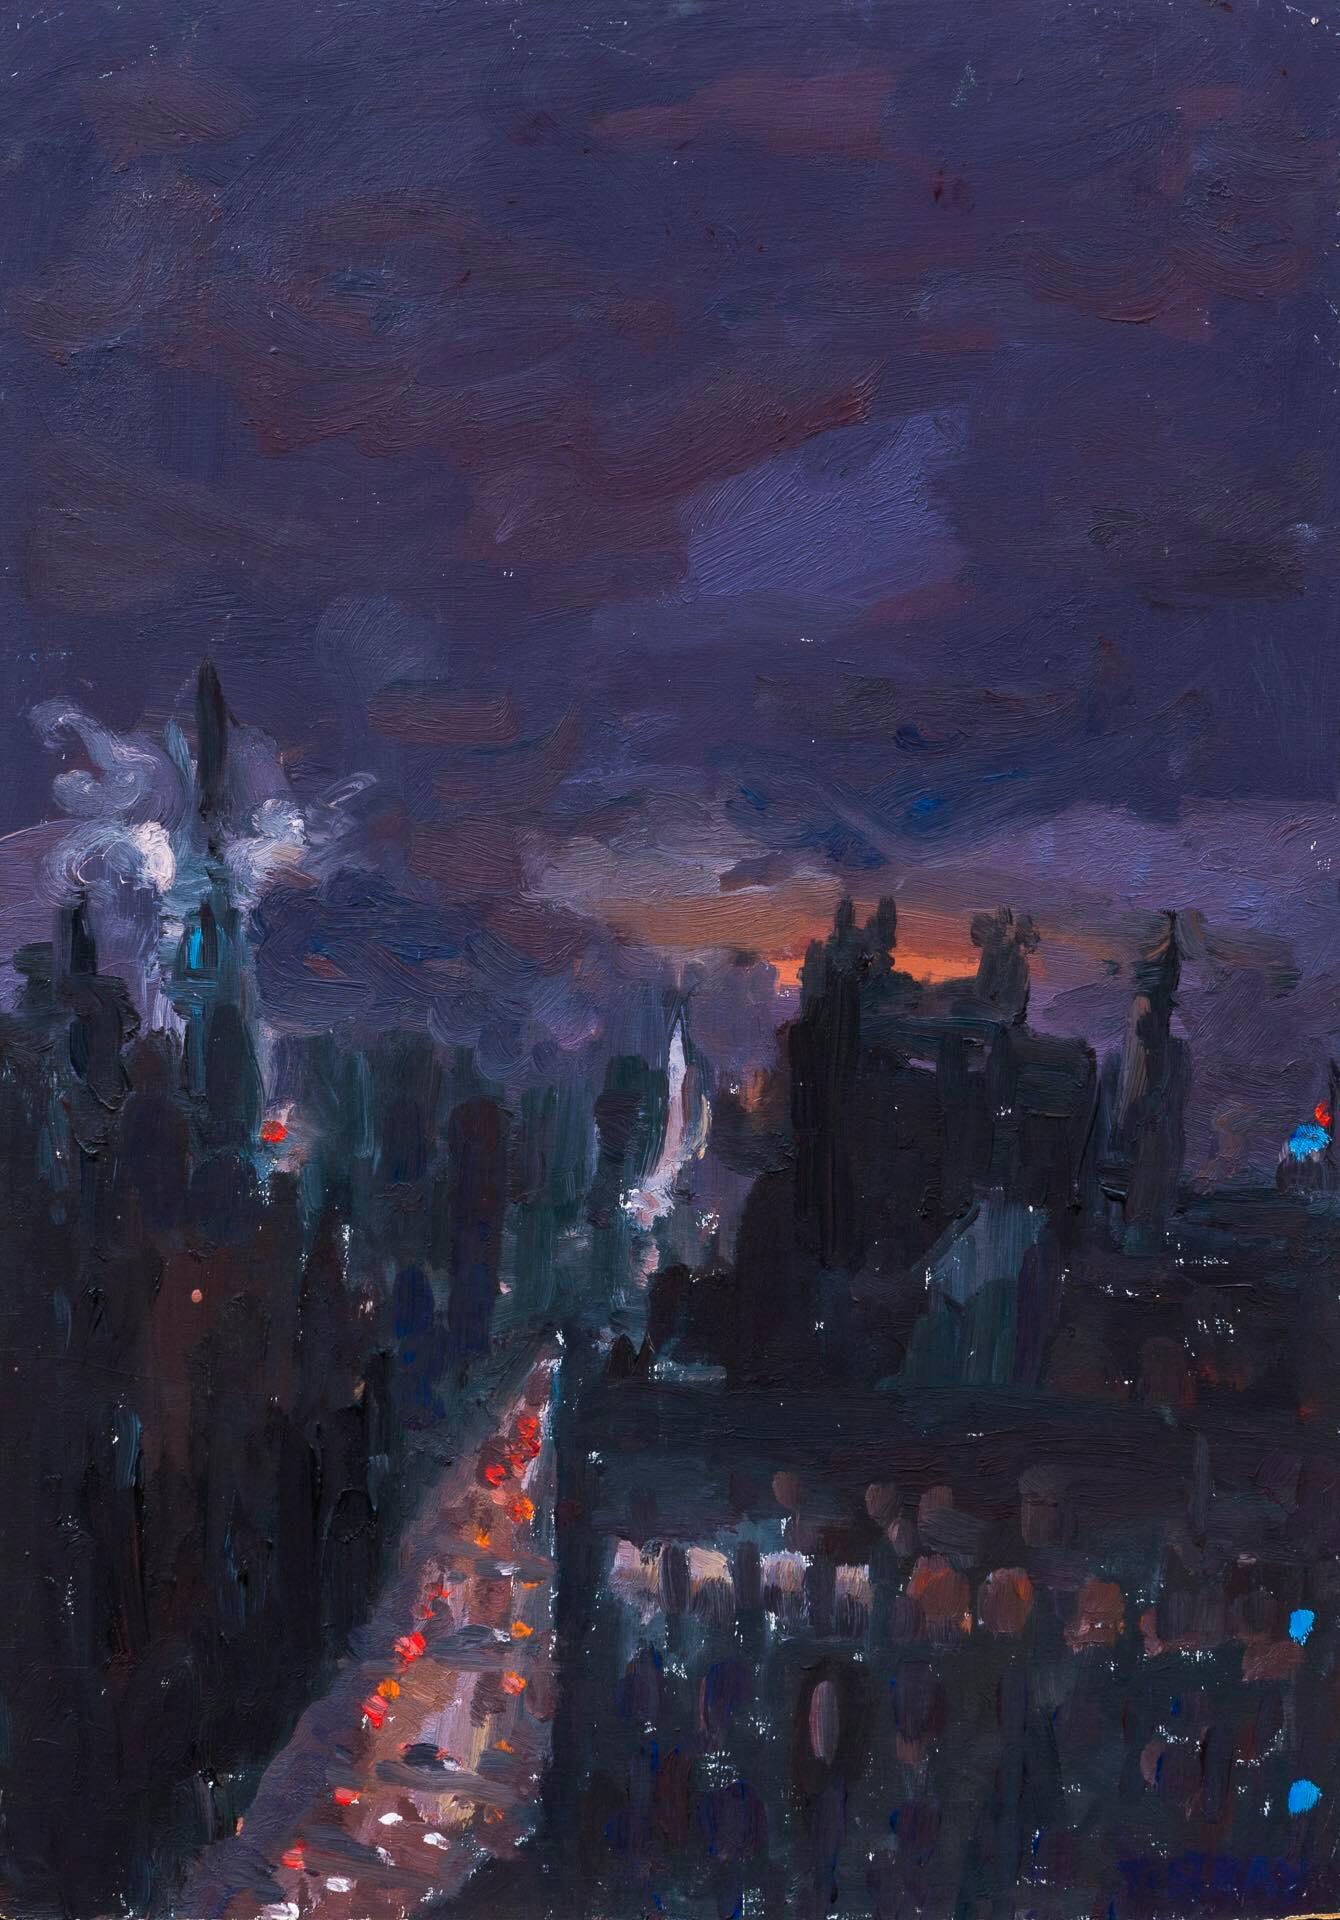 Twilight zones in Manhattan